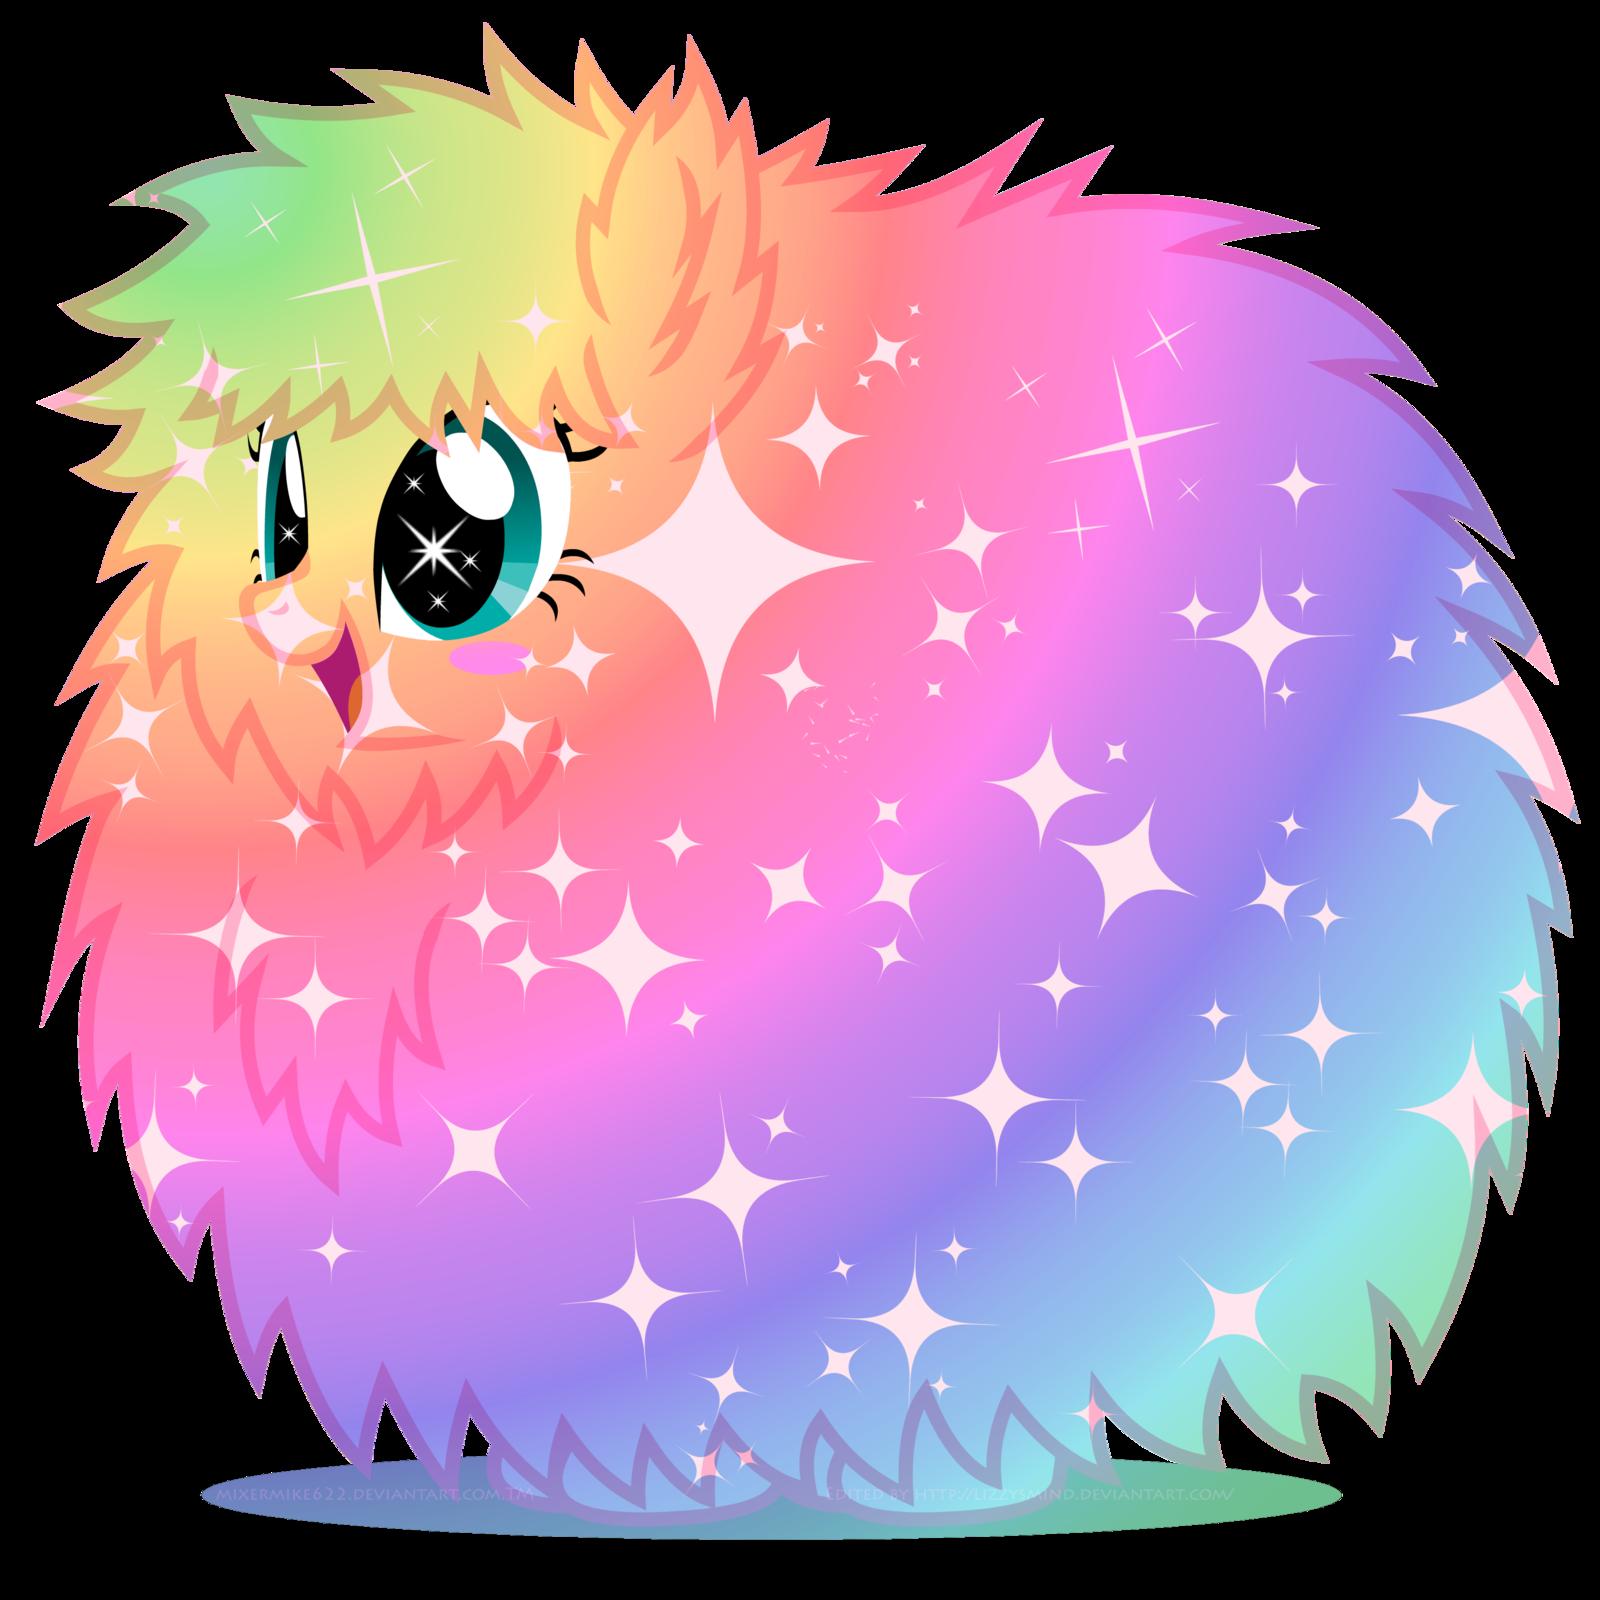 Pink Fluffy Unicorns Dancing On Rainbows Fluffle Puff